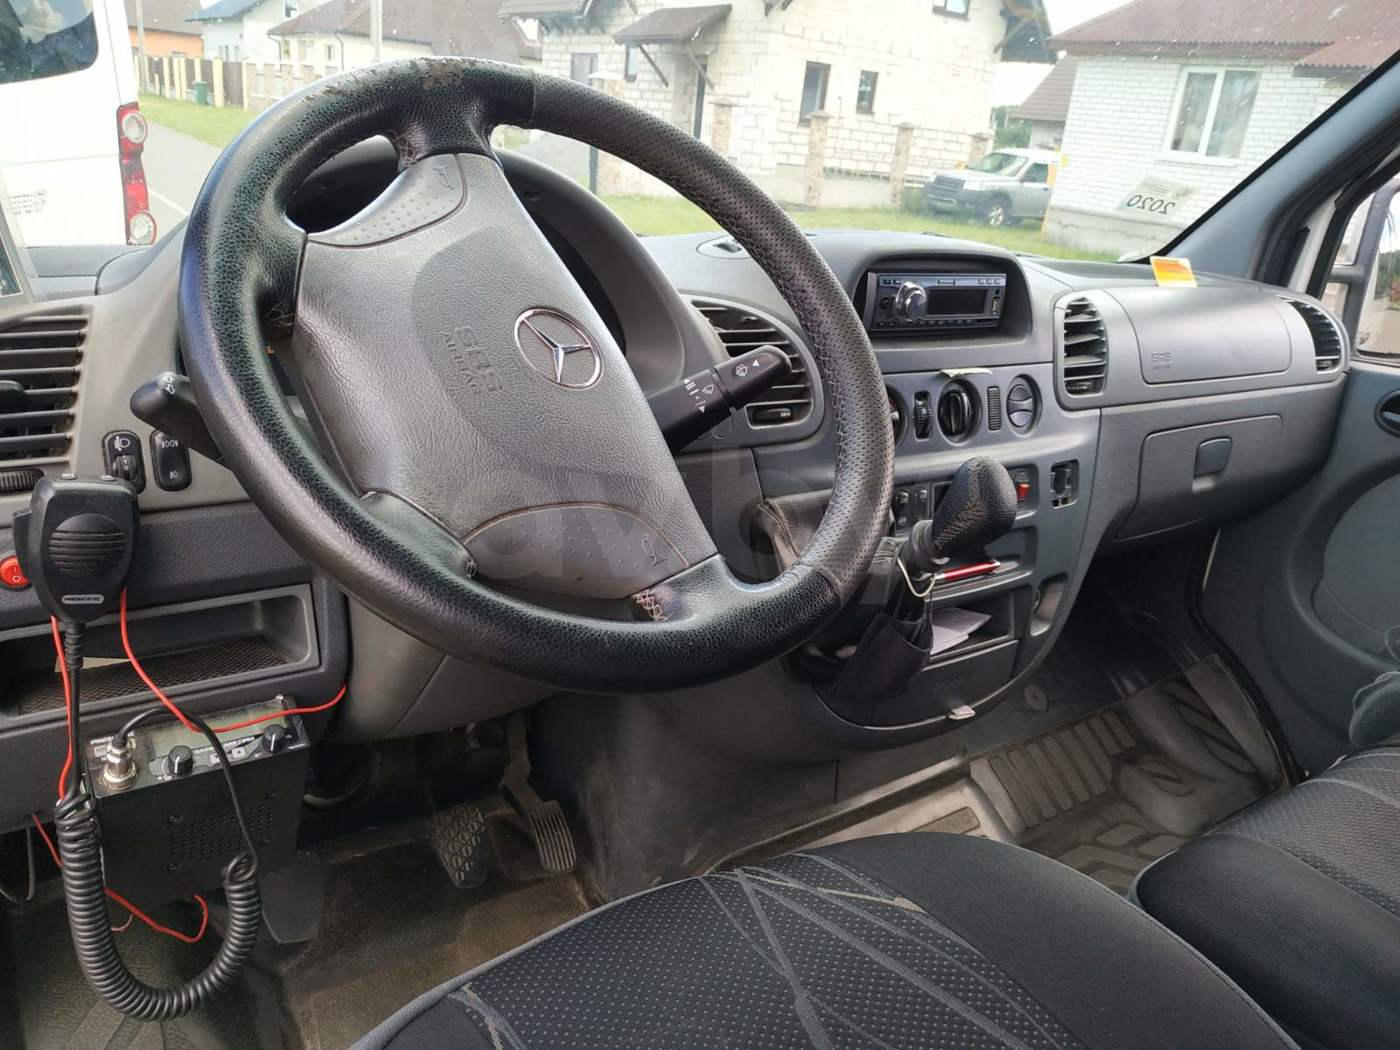 Mercedes-Benz Sprinter 213, 2002 г.